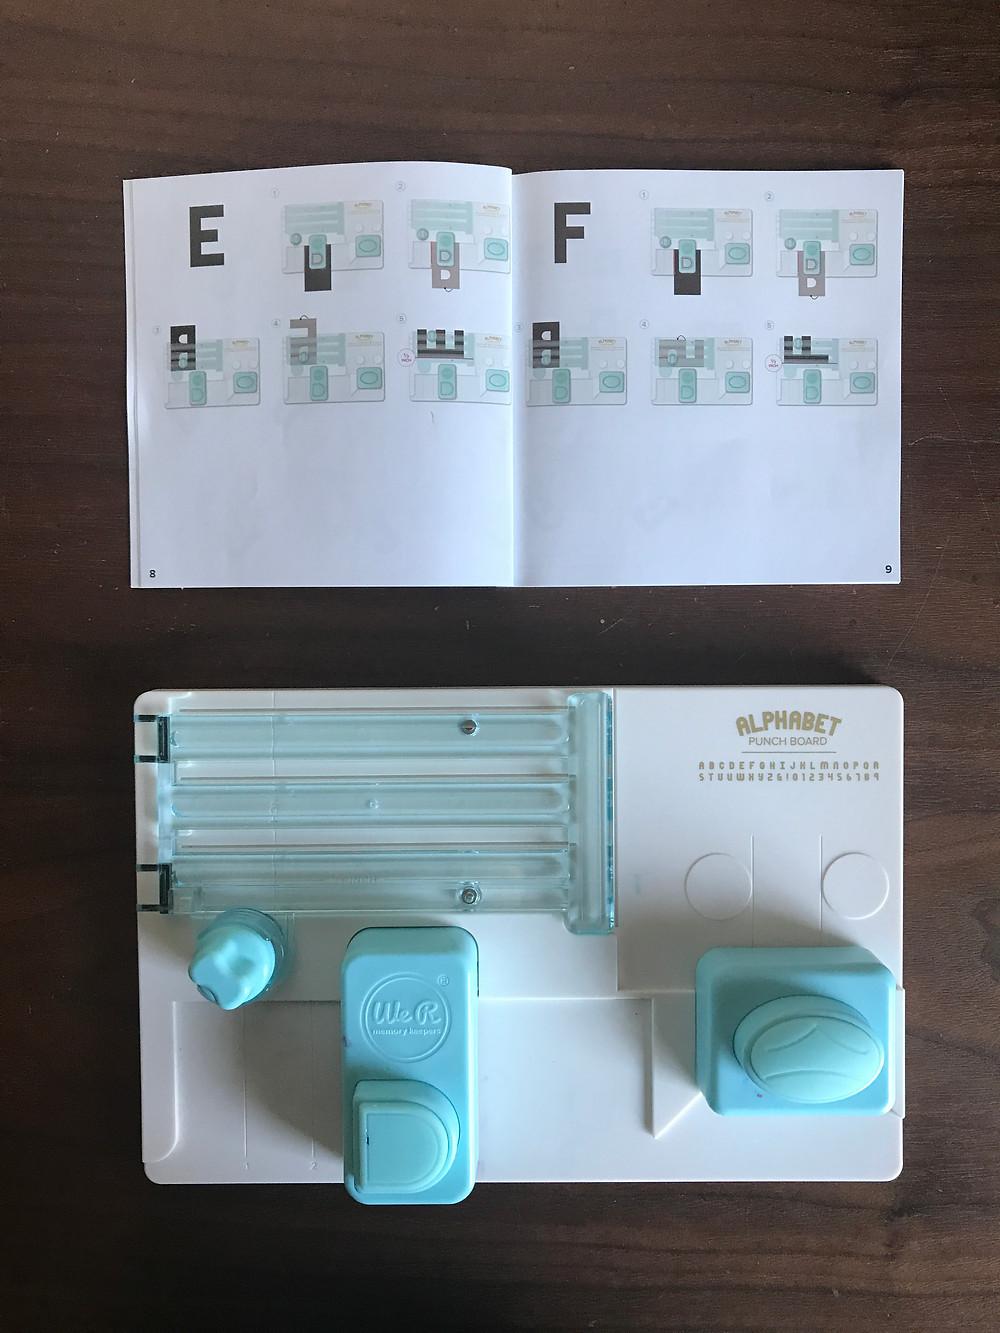 Alphabet punch board